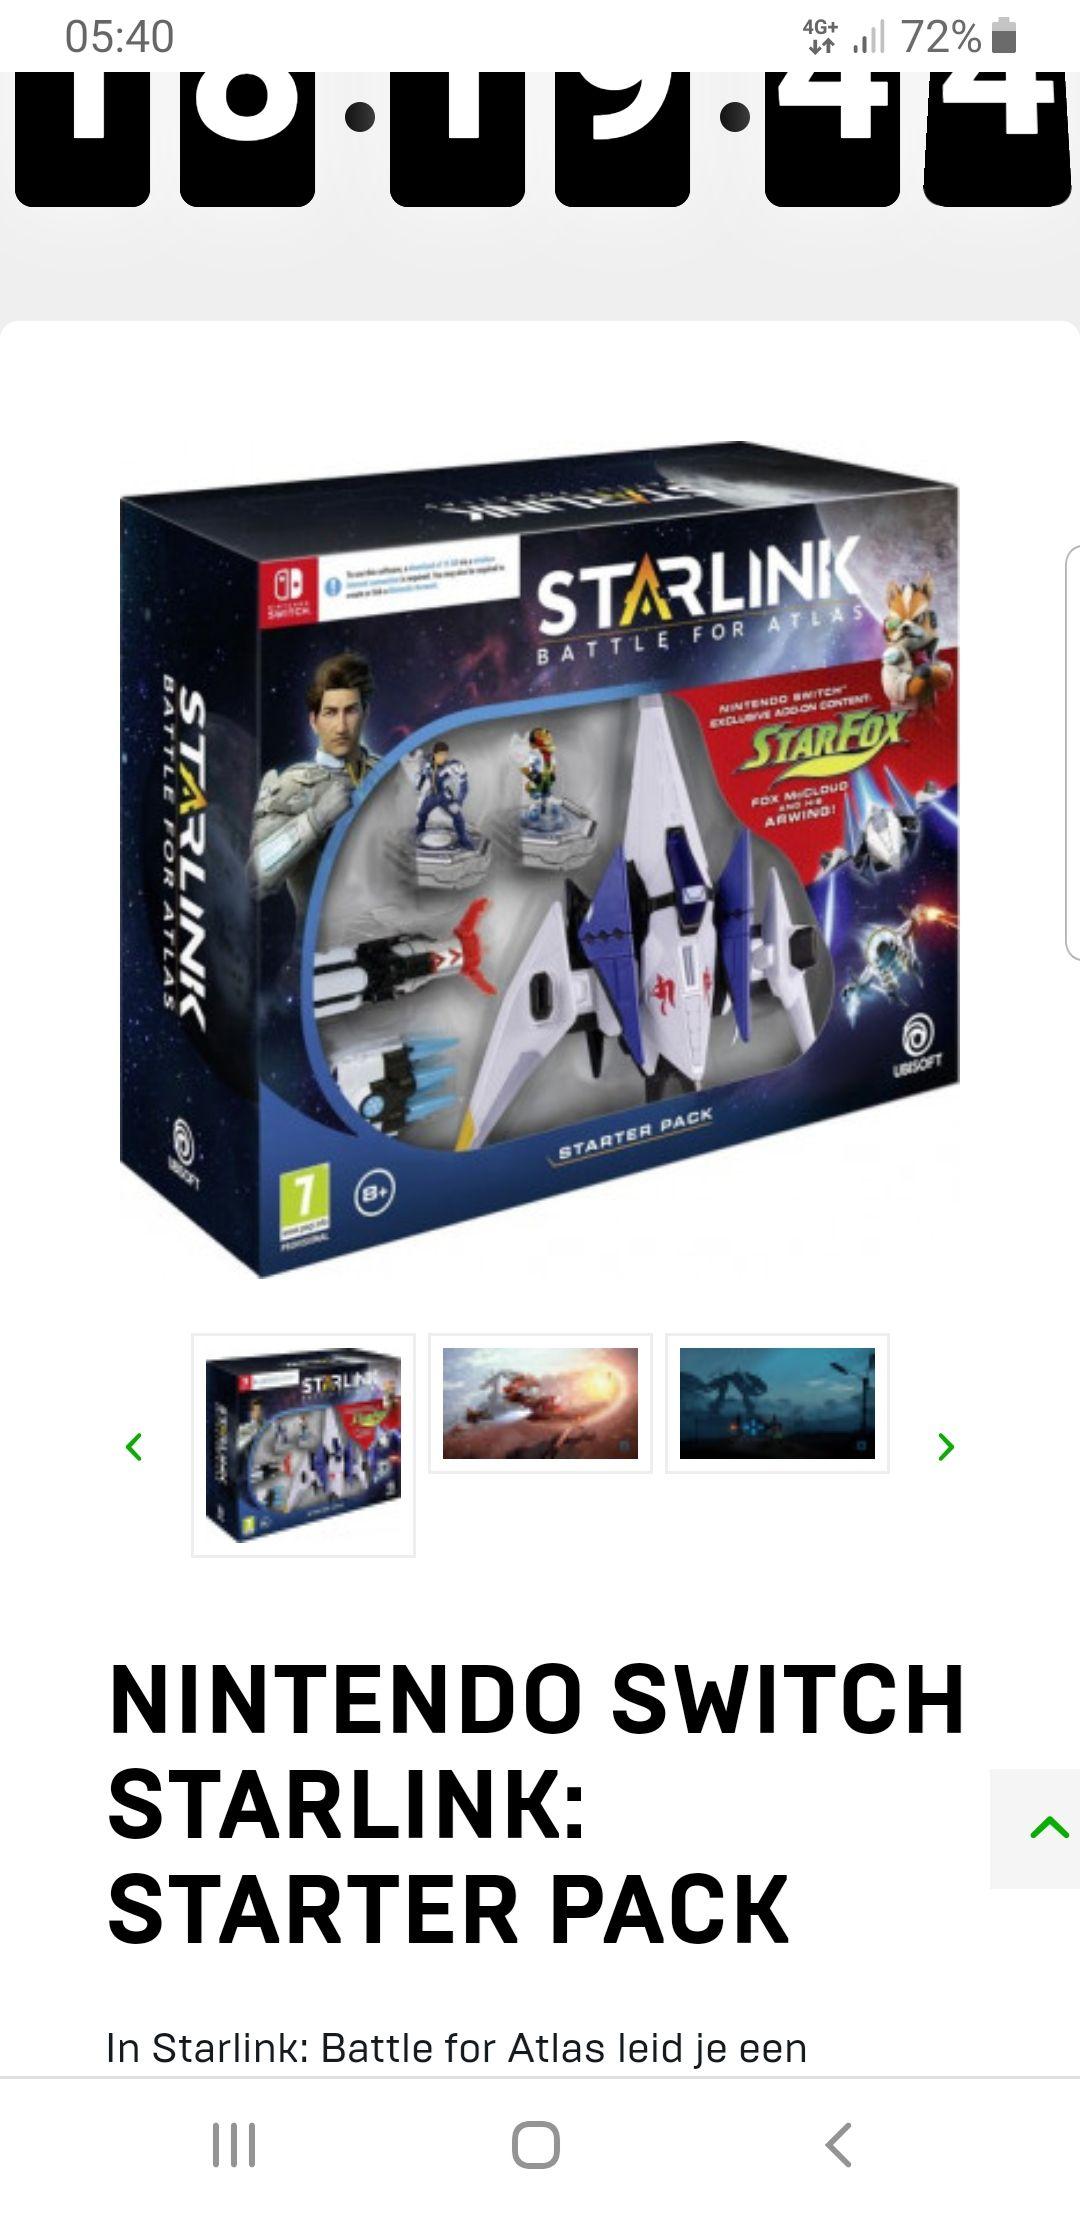 Nintendo Switch - Starlink: Starter Pack